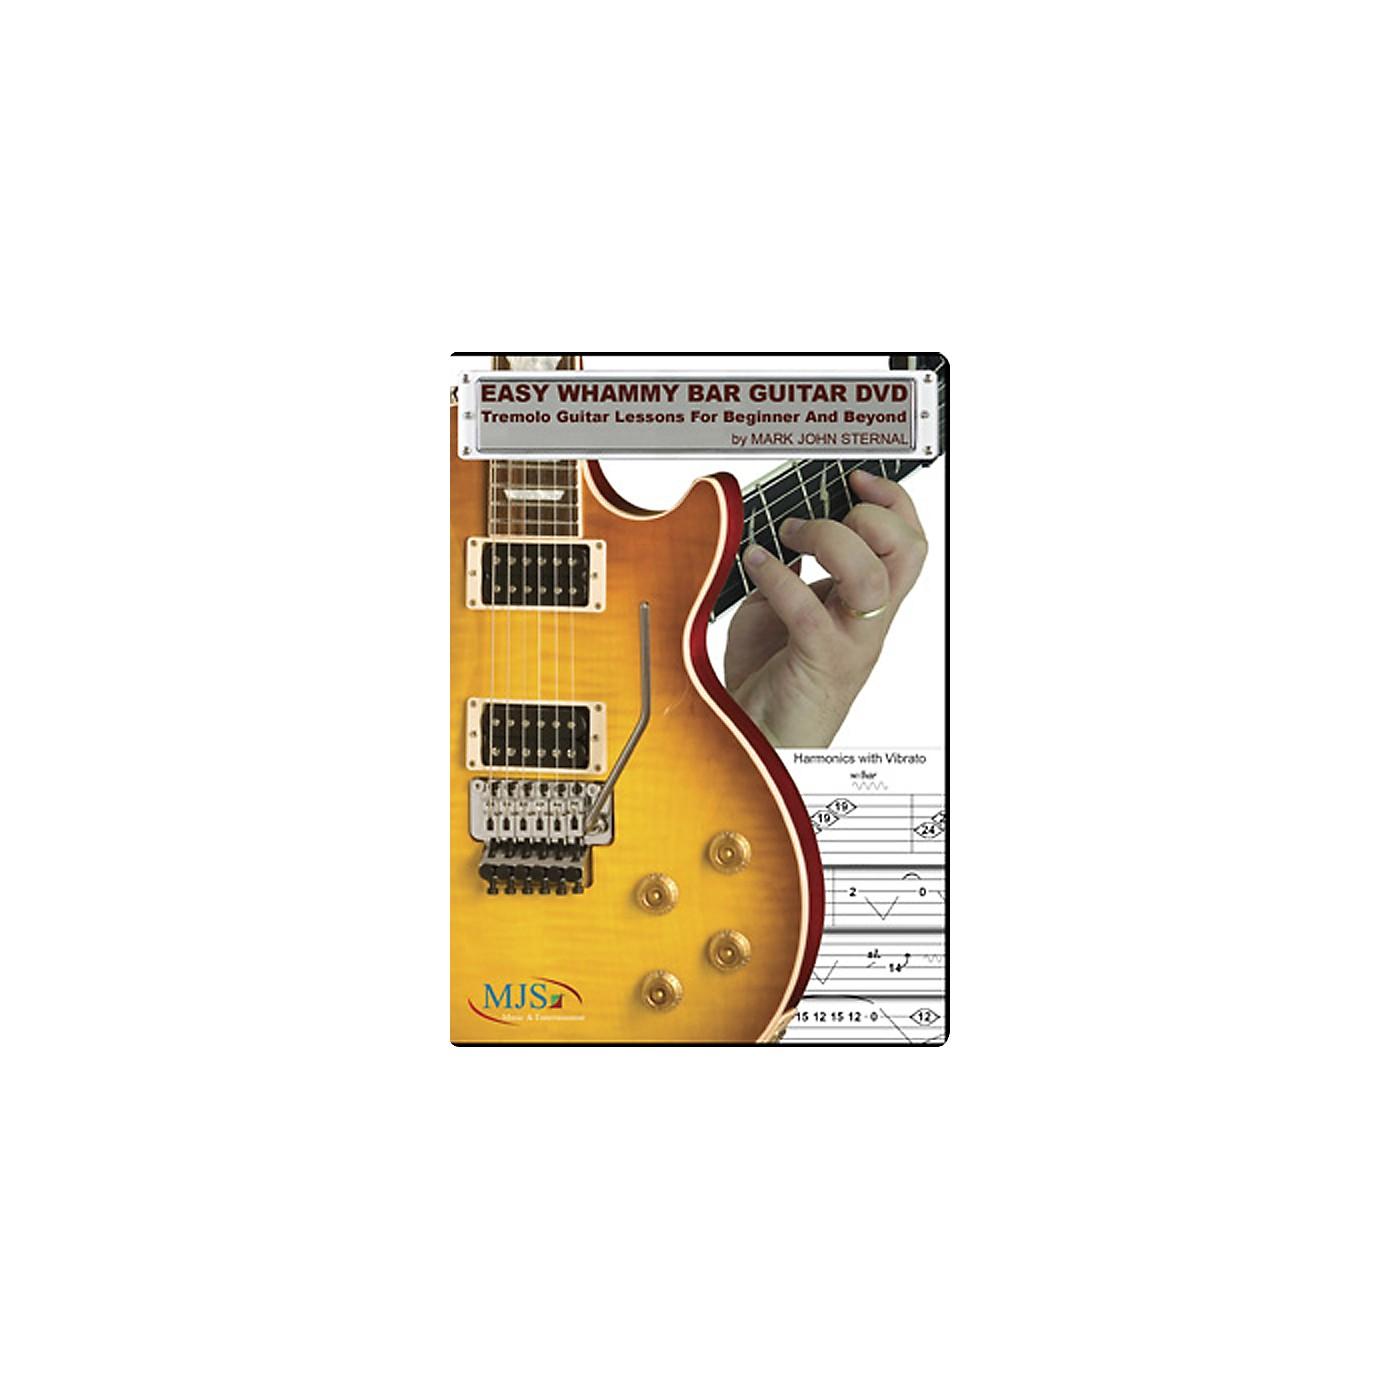 MJS Music Publications Easy Whammy Bar Guitar DVD thumbnail